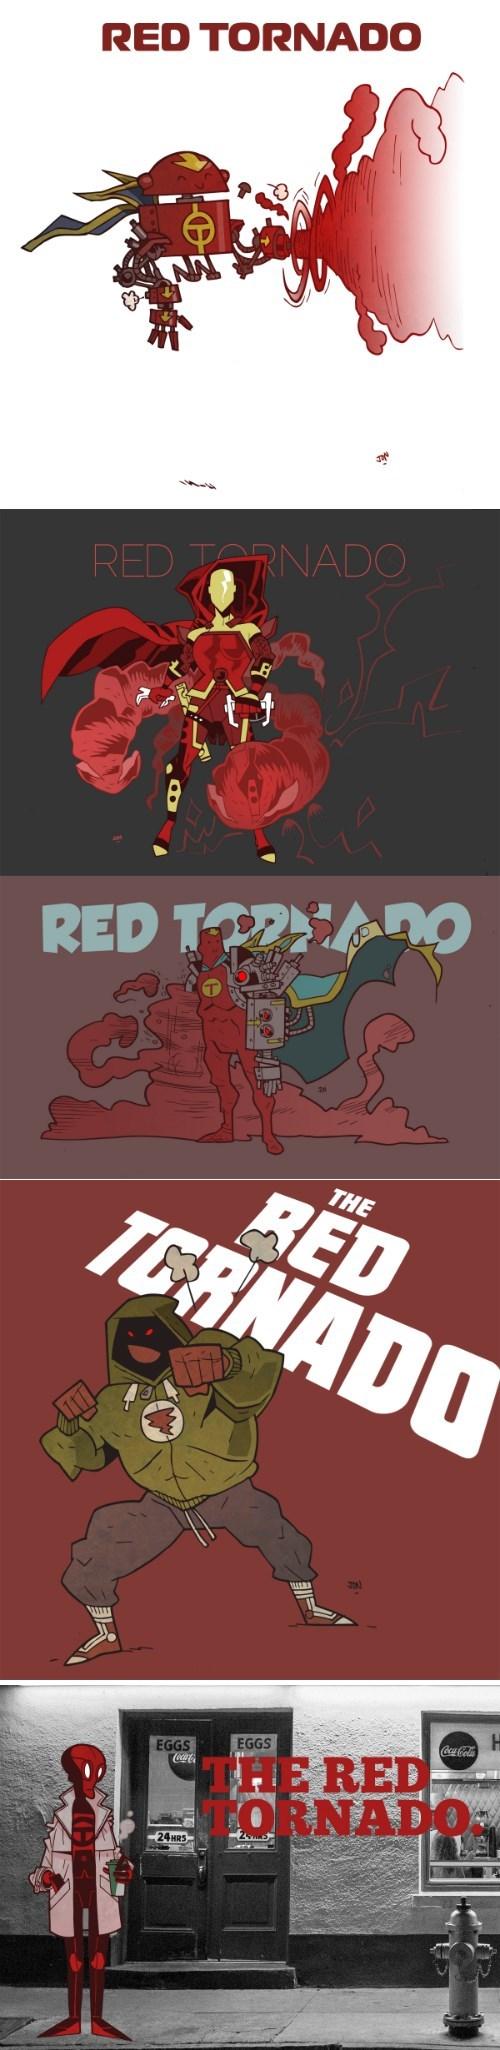 DC red tornado comics Fan Art - 7819666432